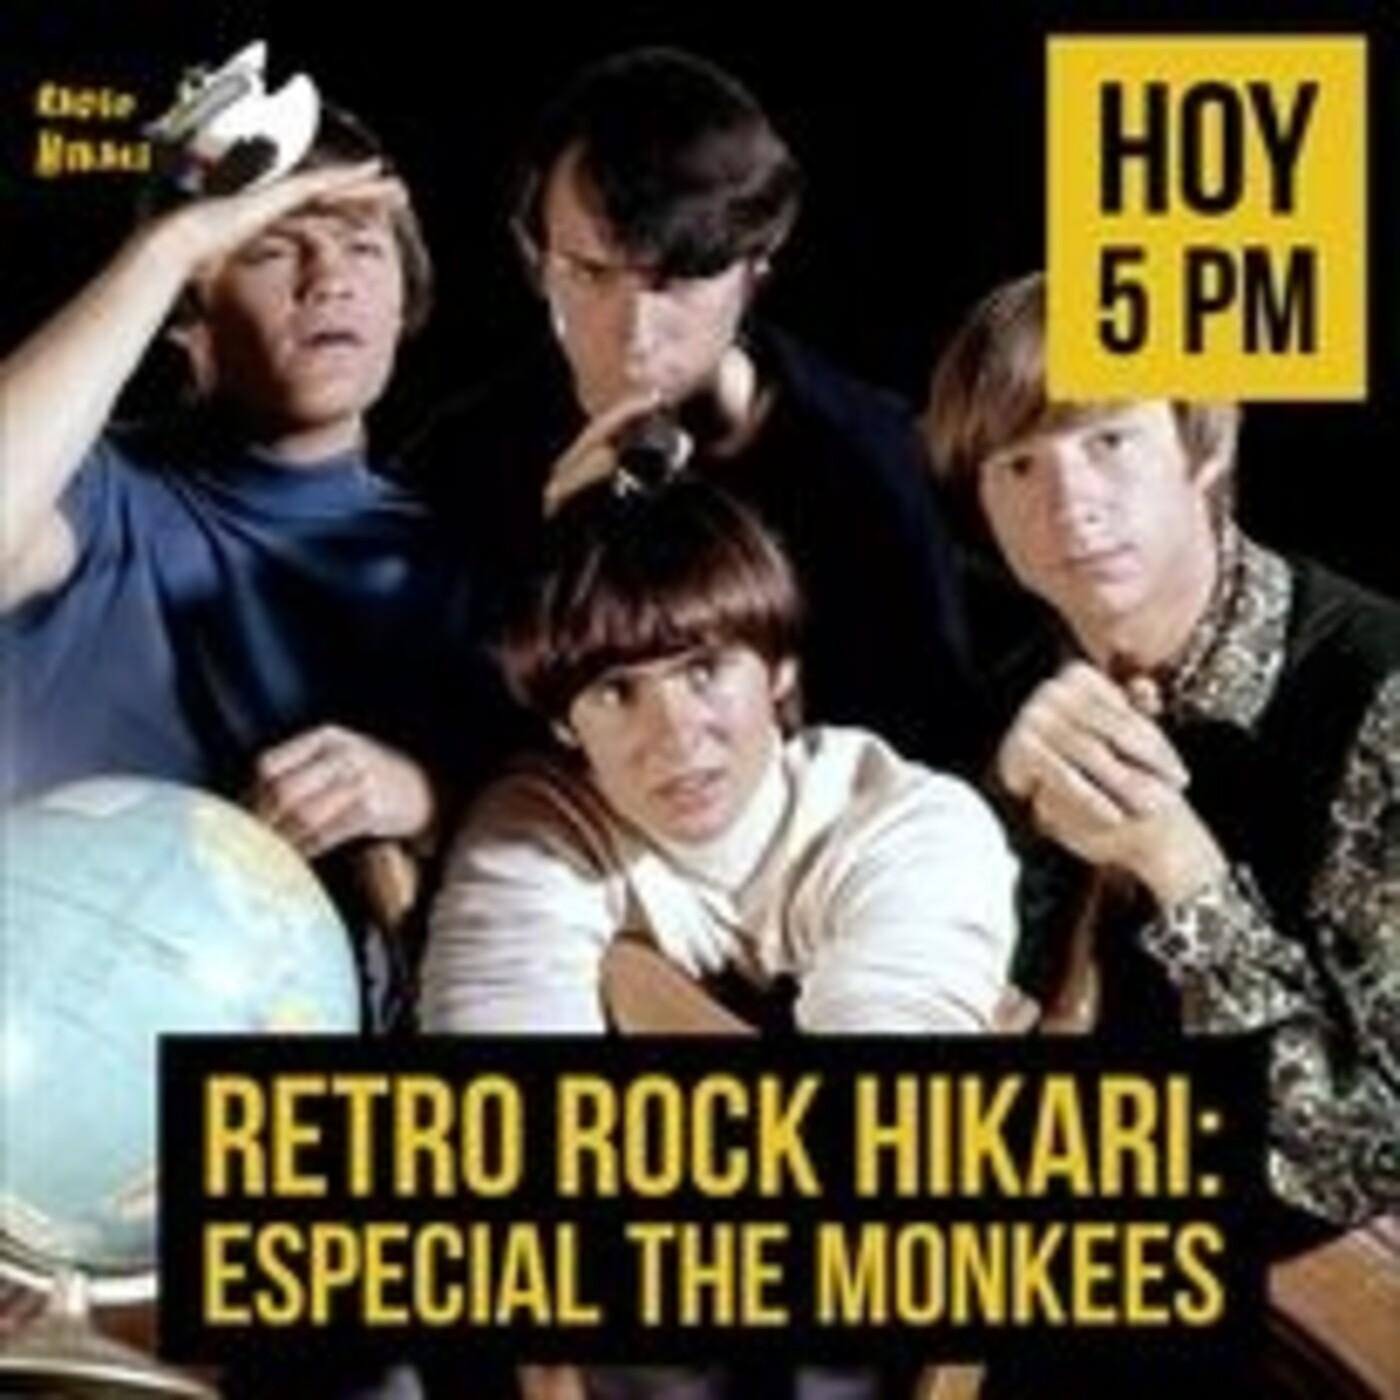 Retro Rock Hikari: Especial The Monkees